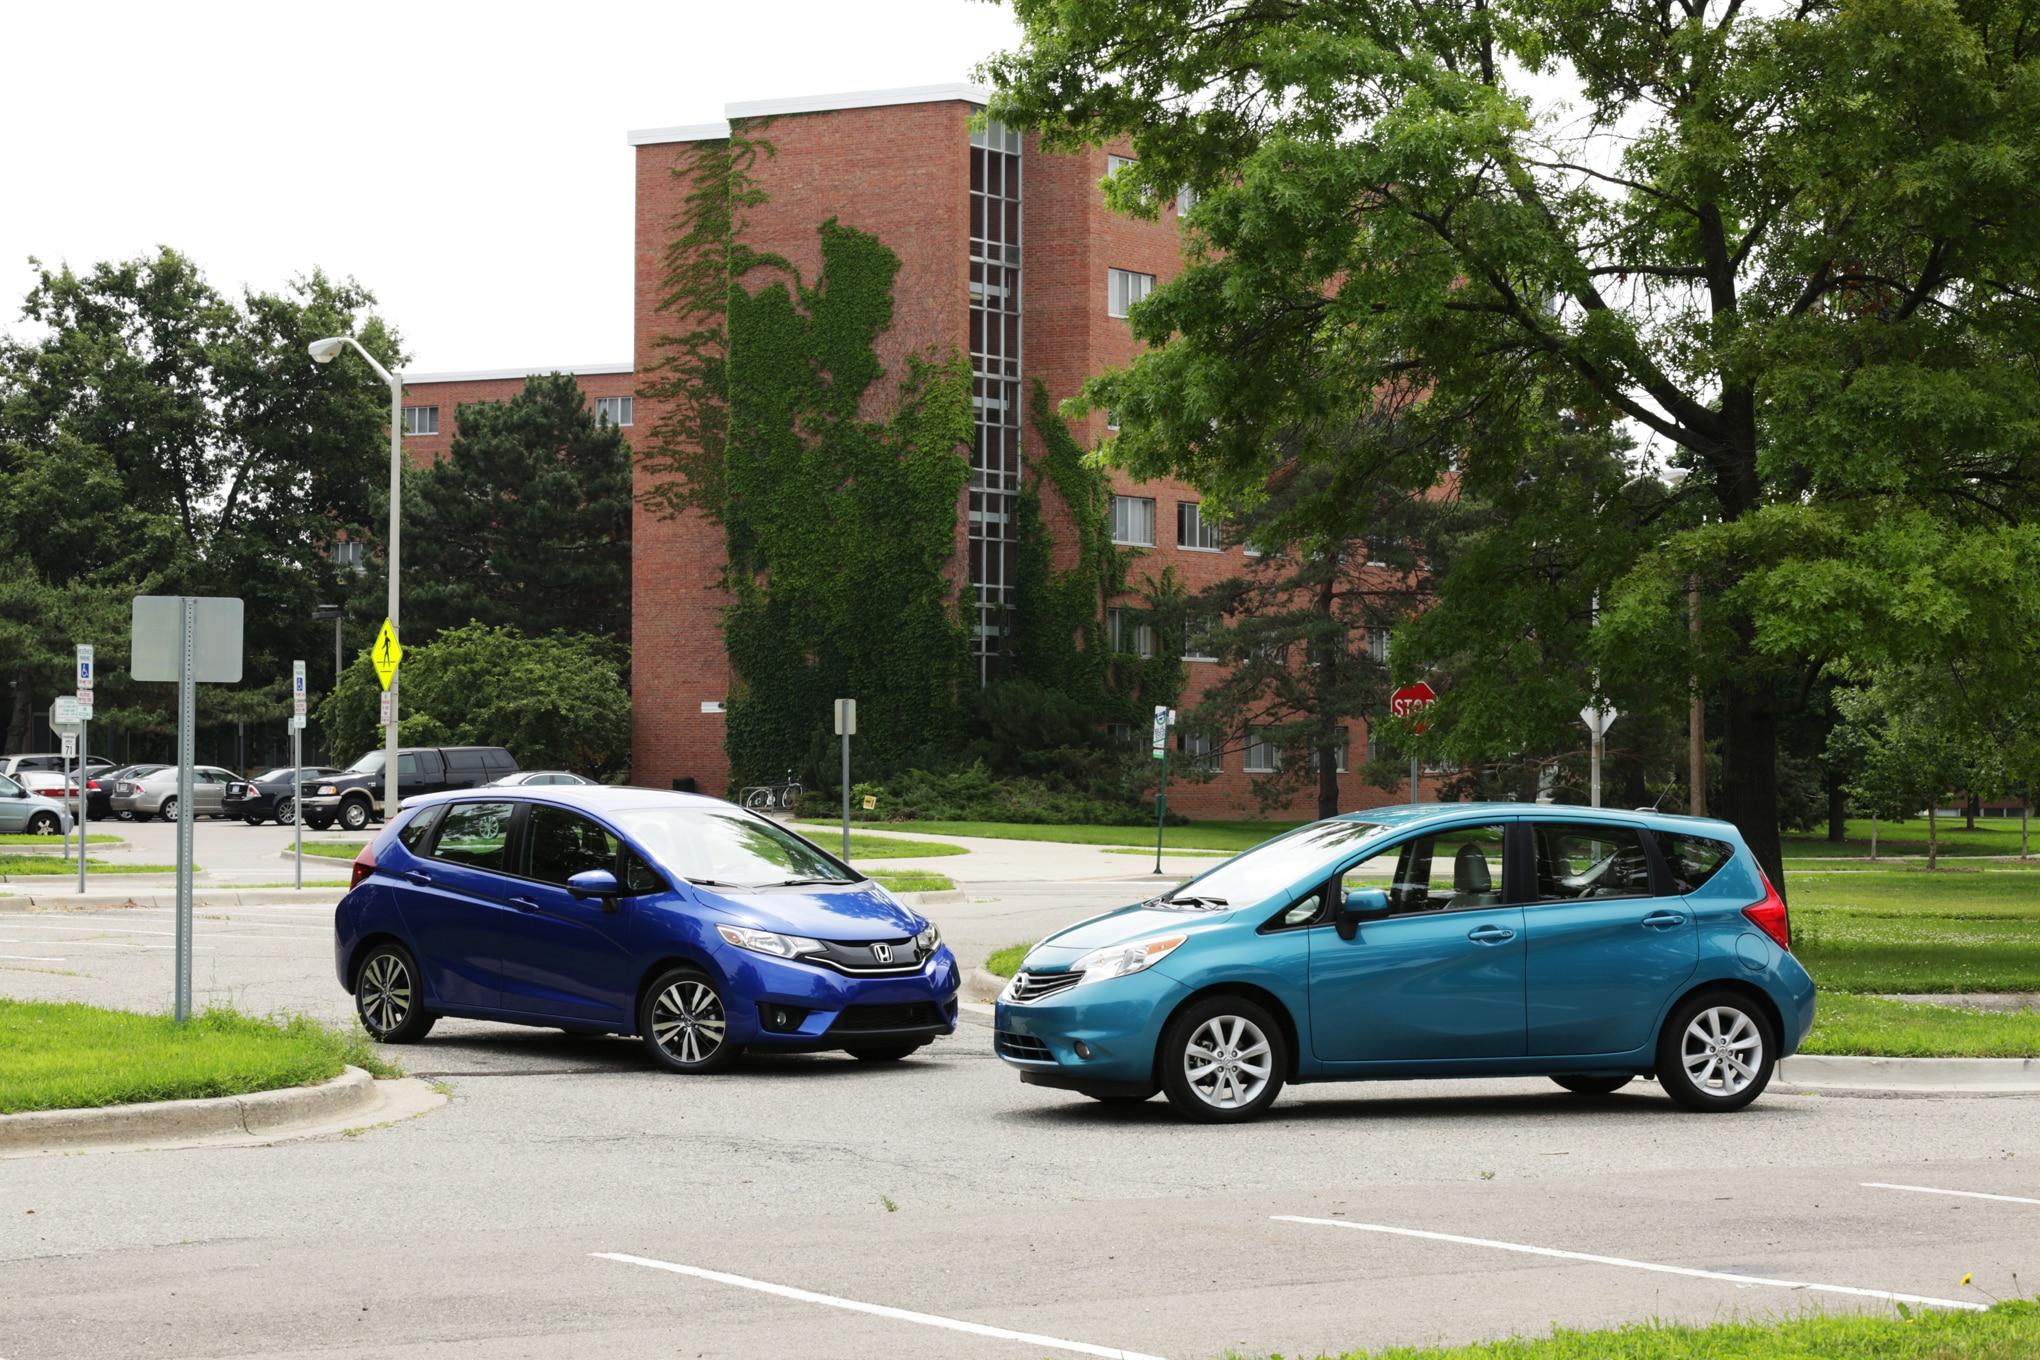 Ford Focus St Specs 0 60 >> 2015 Honda Fit EX-L vs. 2014 Nissan Versa Note SL Comparison